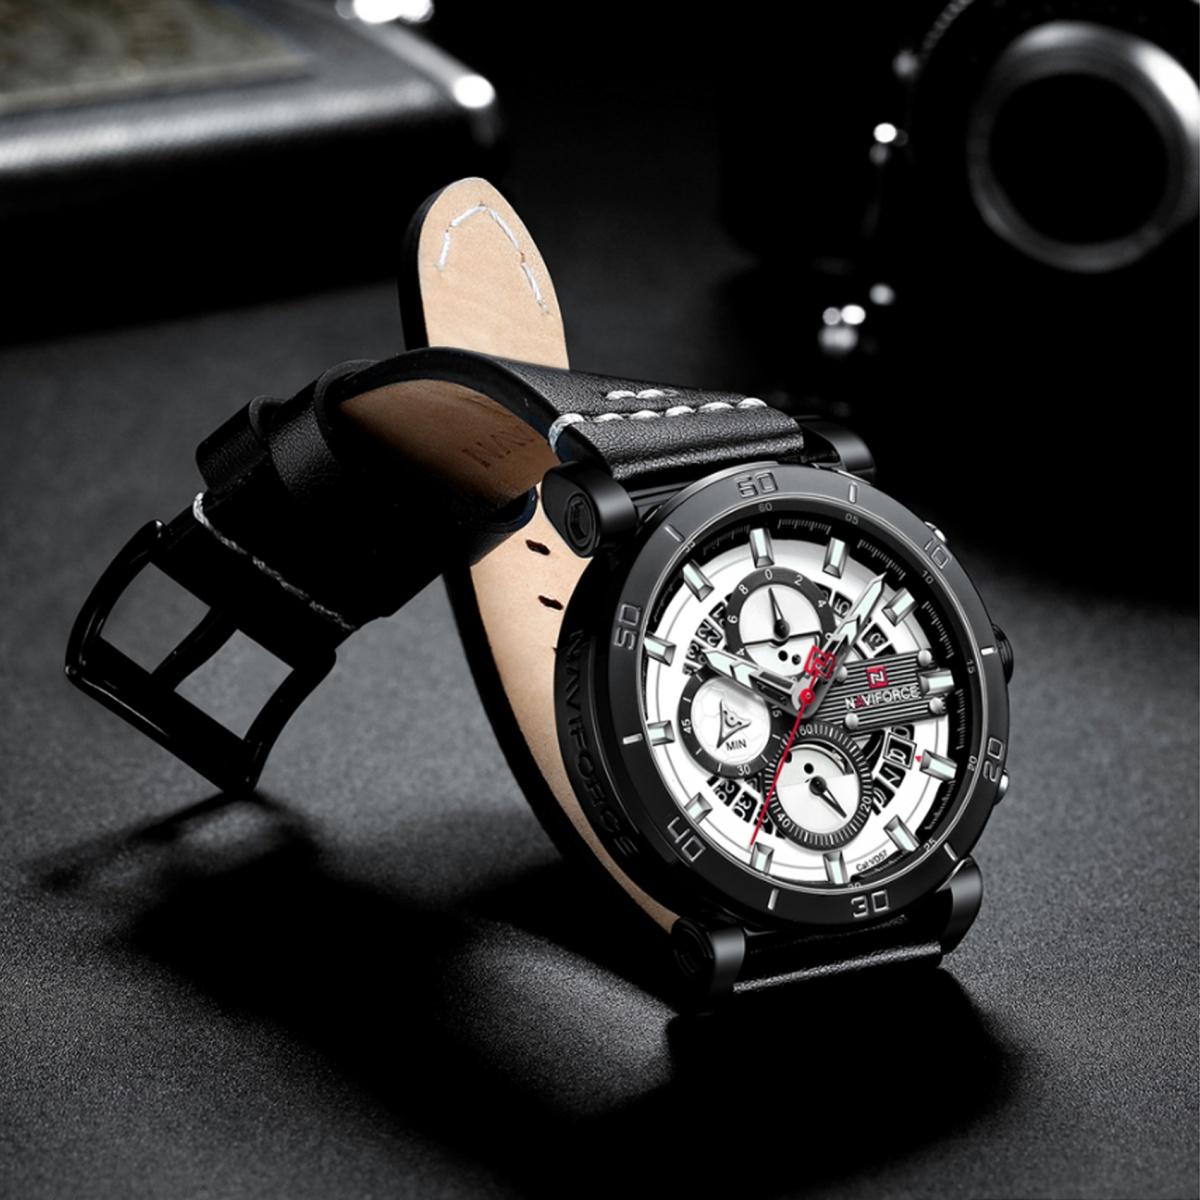 Naviforce 9131 Analog Sports Leather Quartz Watch - Black